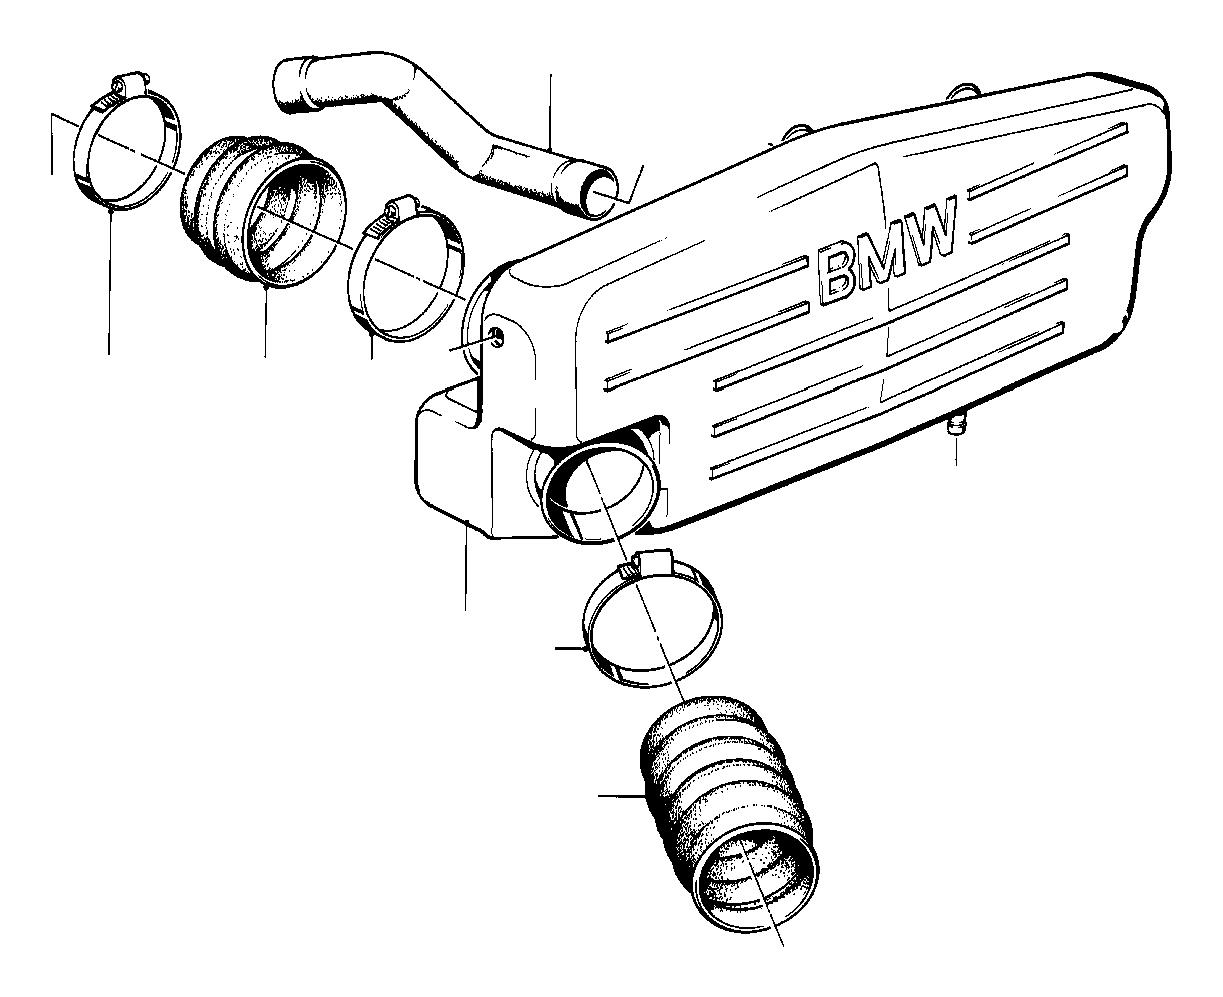 2003 bmw m5 hose clamp  l83